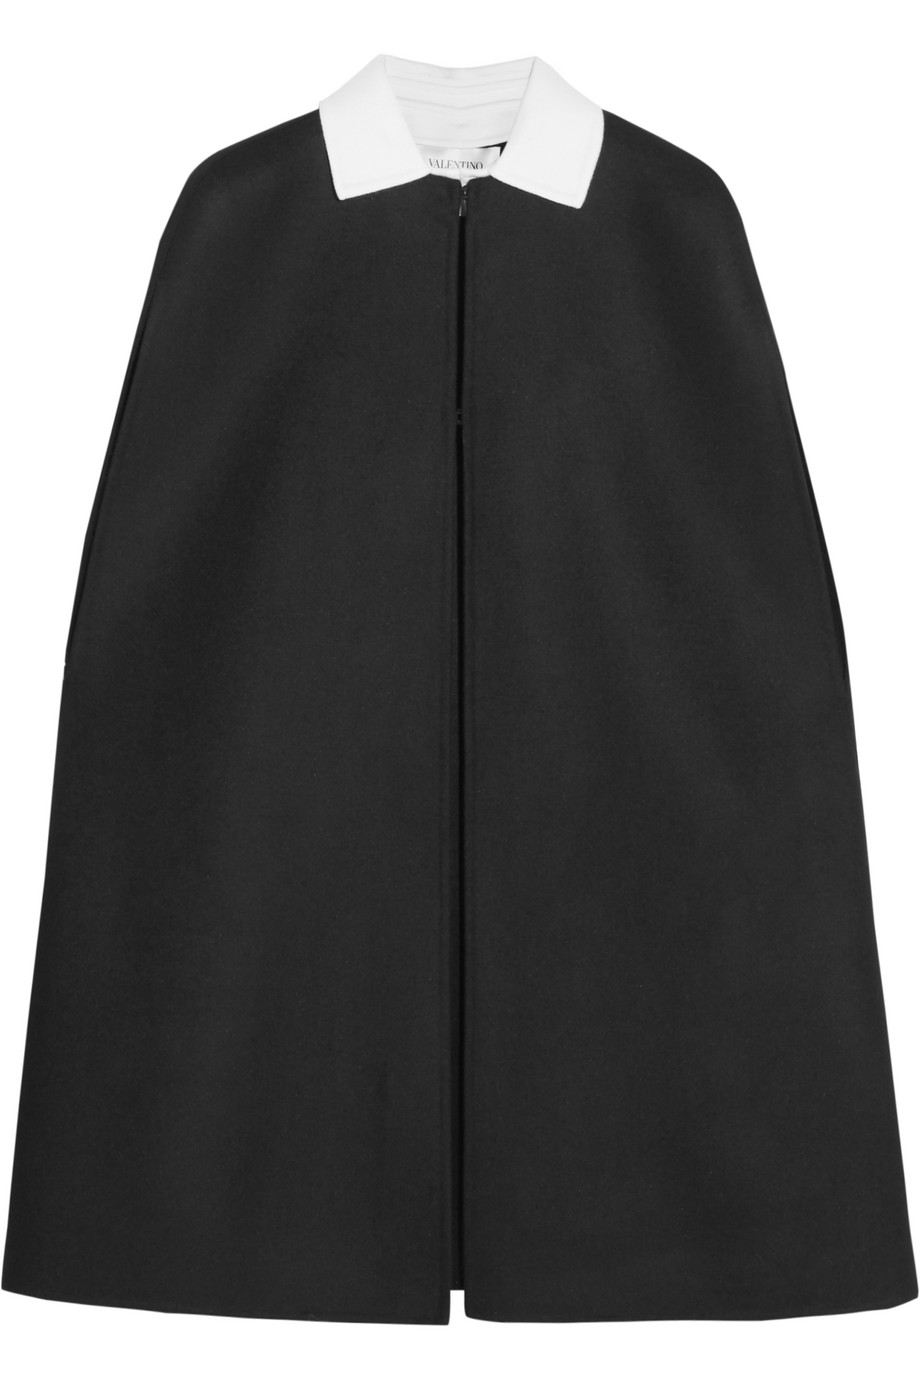 Valentino Two-Tone Wool-Blend Felt Cape, Black, Women's, Size: 40